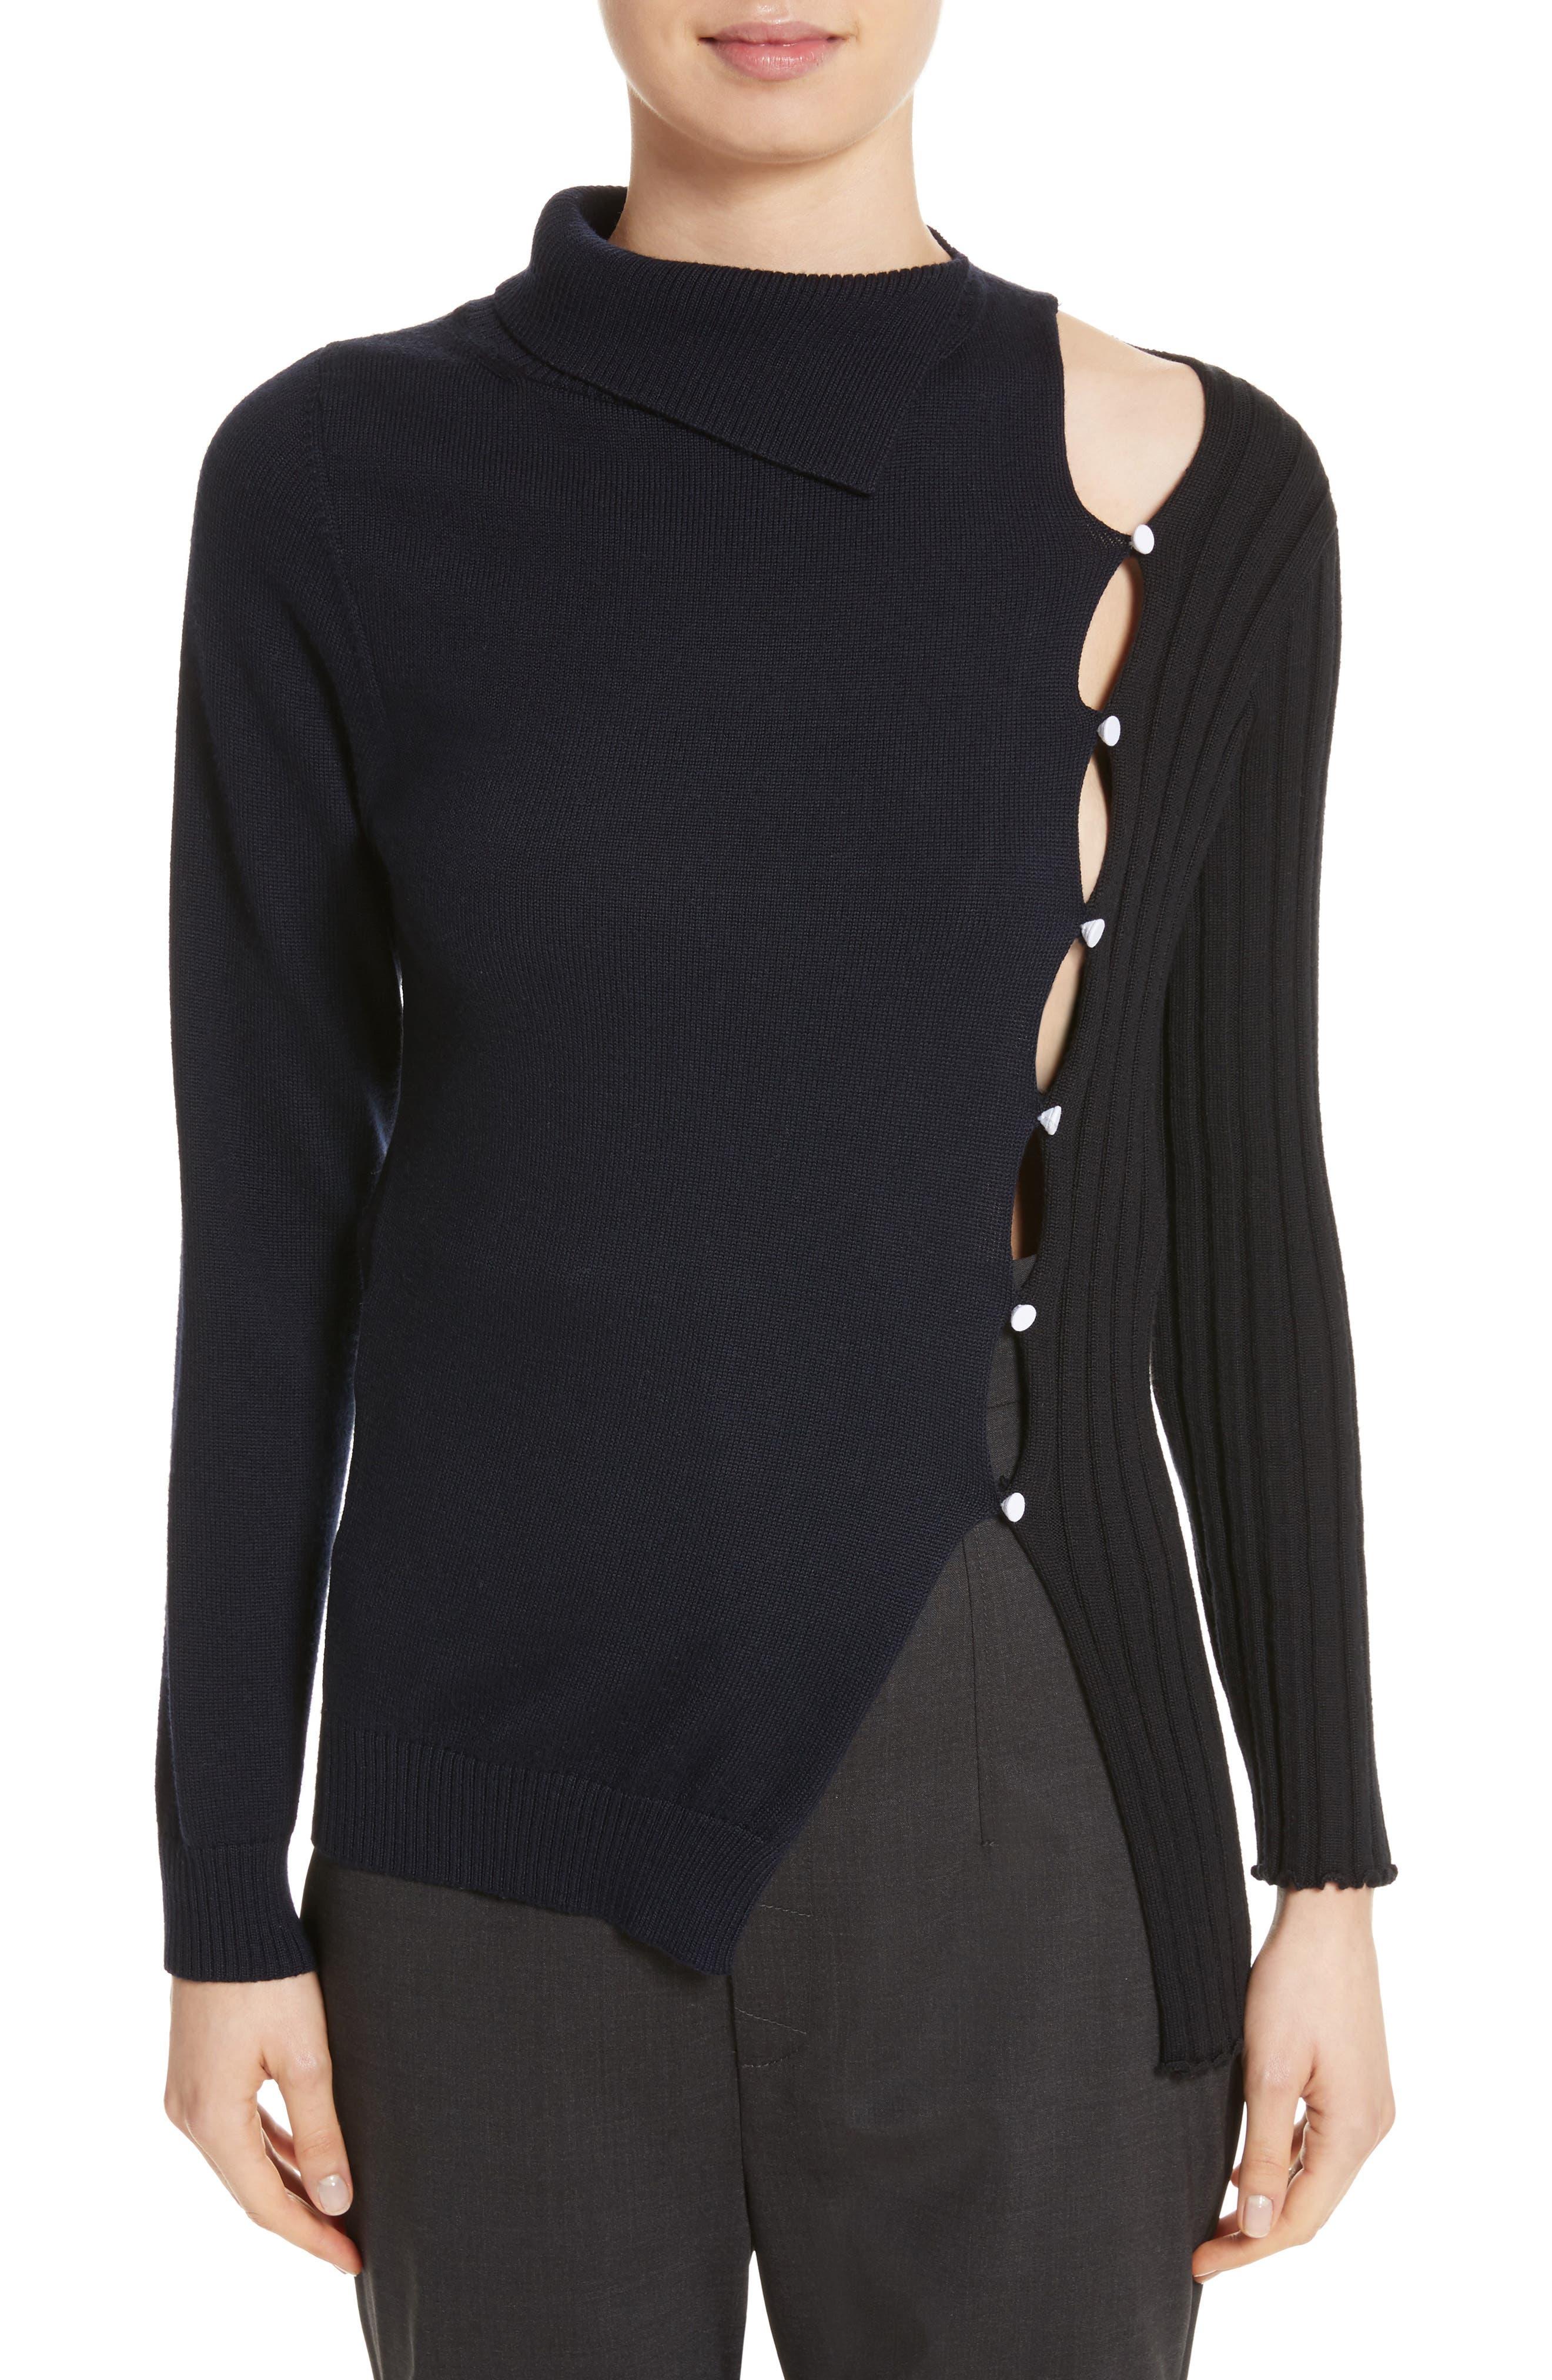 Jacquemus Asymmetrical Button Front Turtleneck Sweater